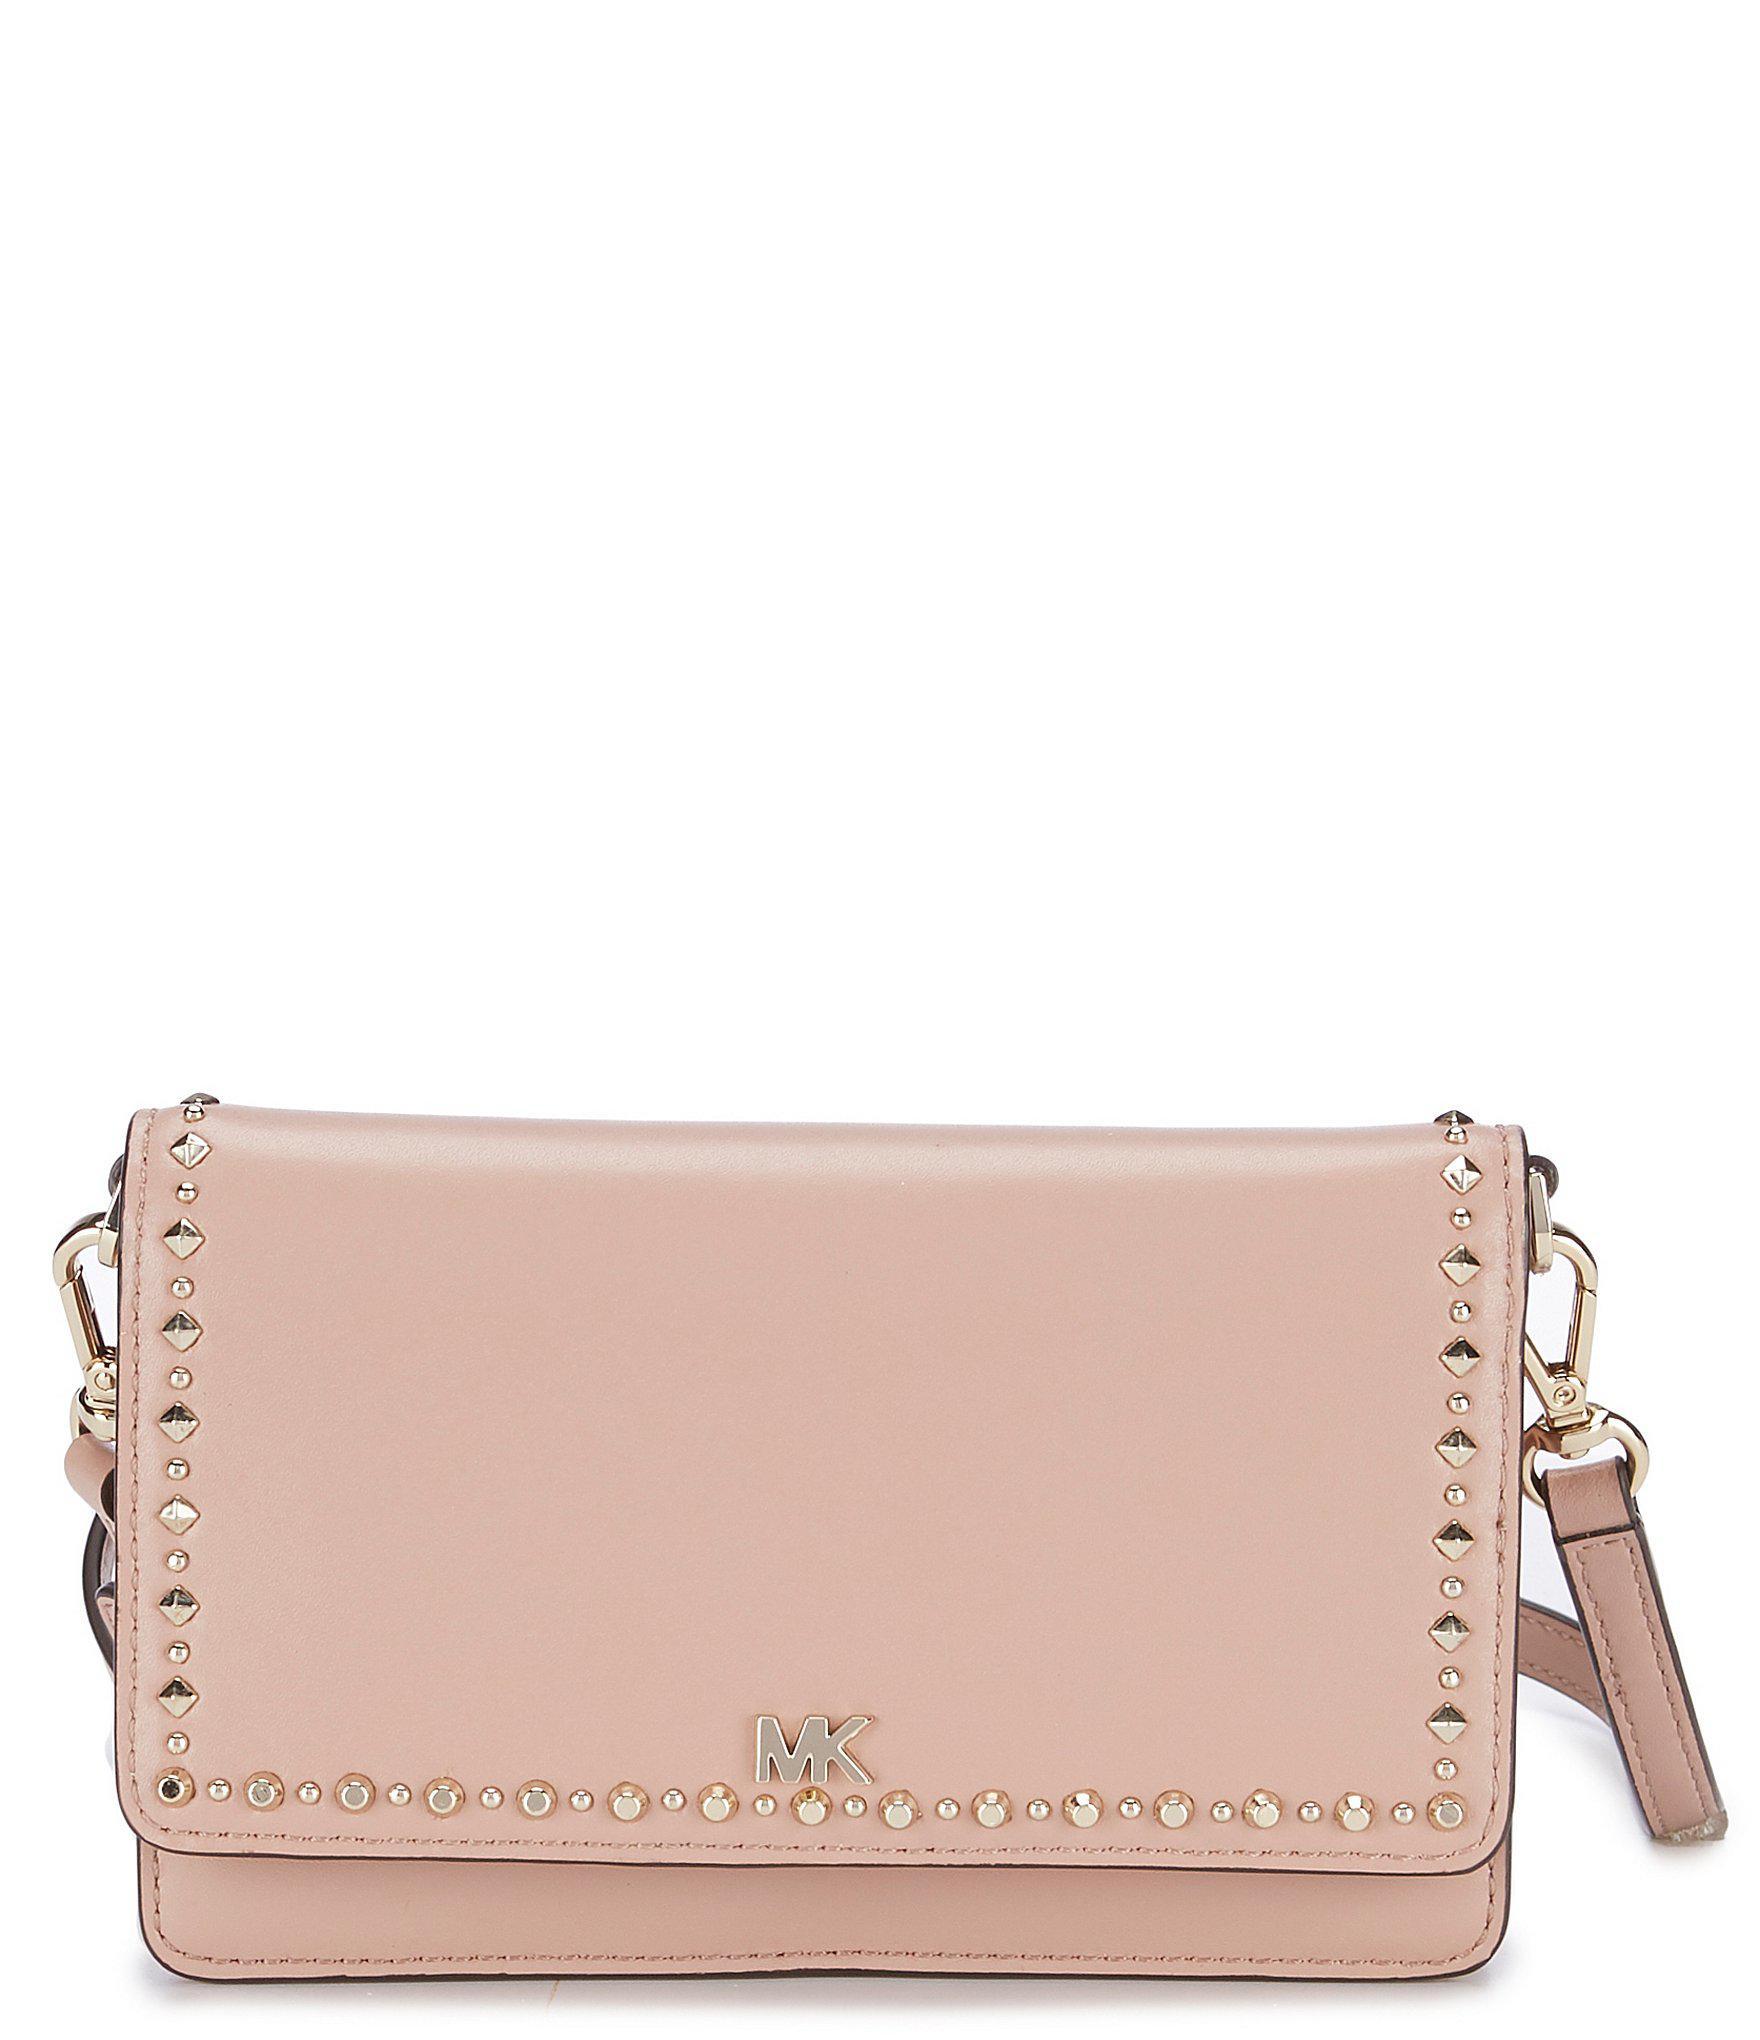 487be315a3f8 MICHAEL Michael Kors. Women s Studded Phone Cross-body Bag